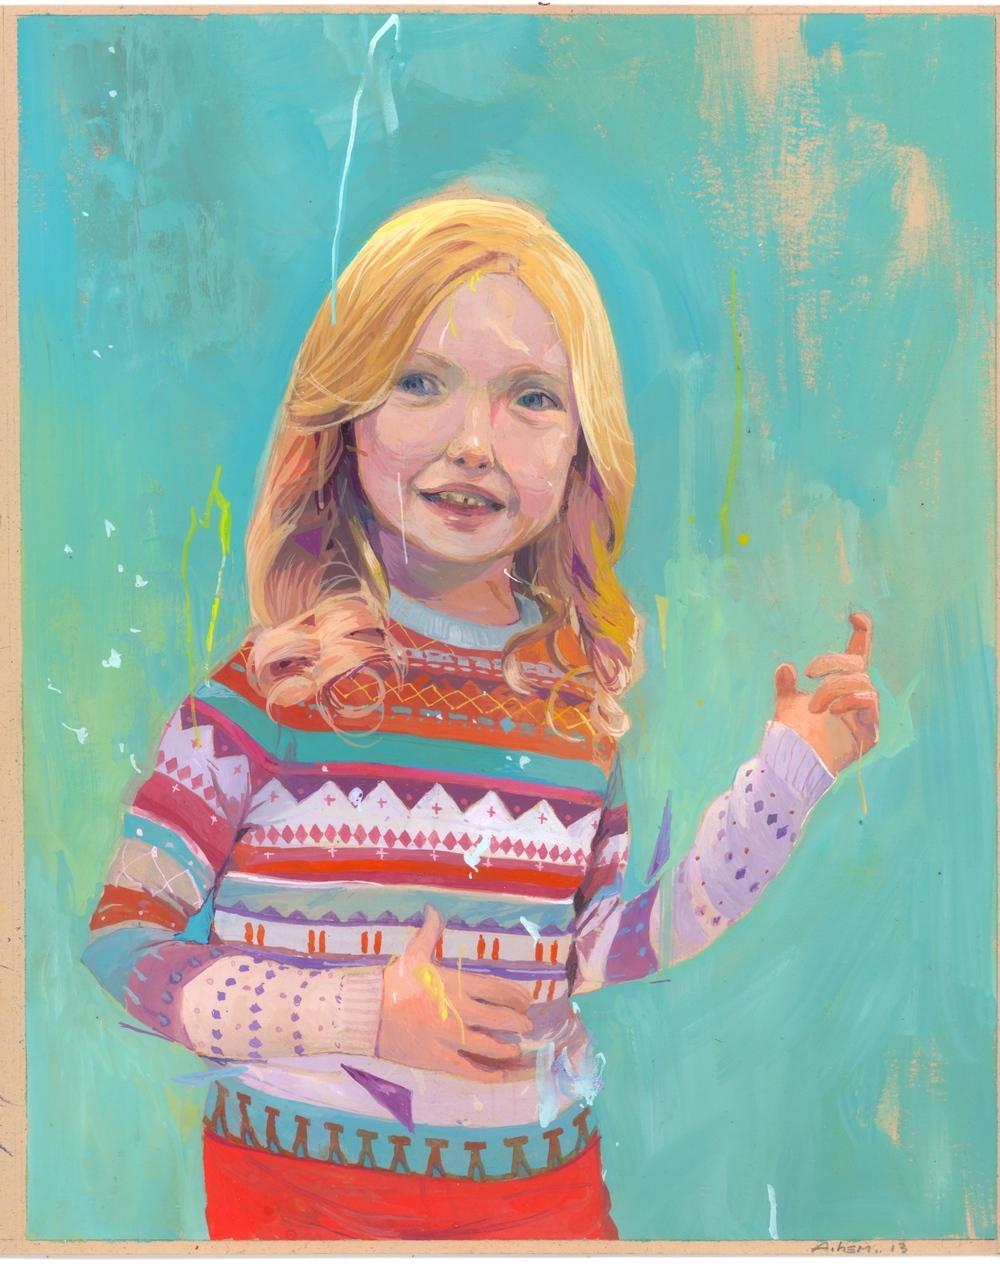 """Paley 5"" by Andrew Hem"